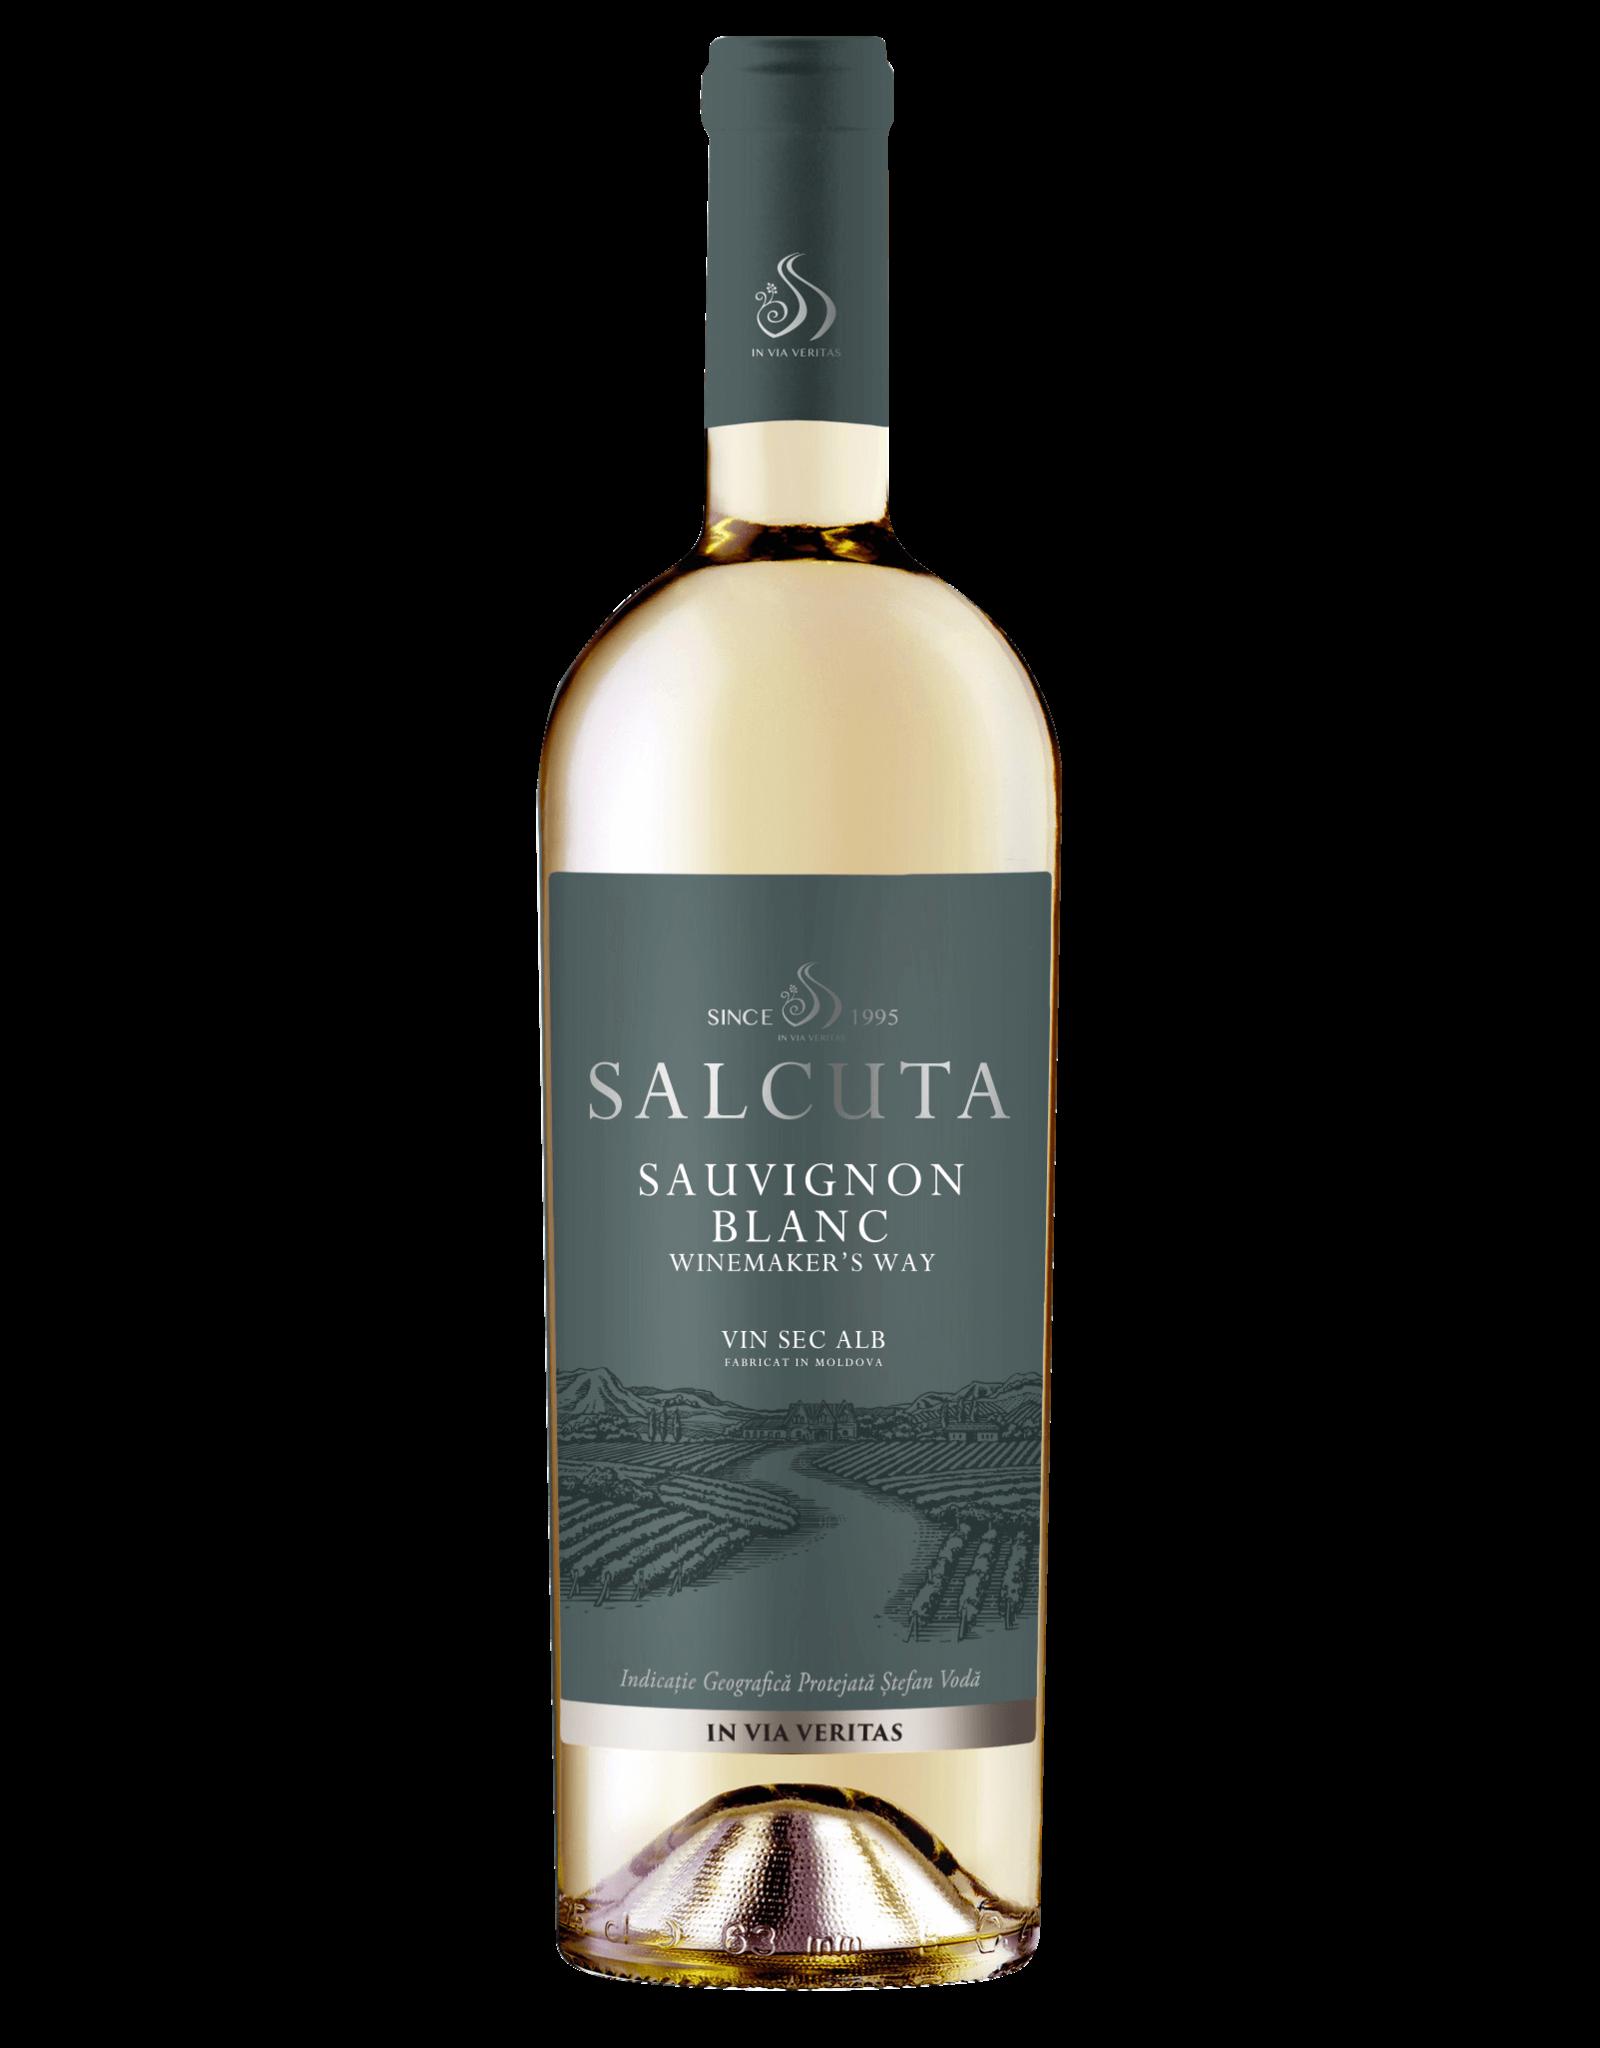 Proef Salcuta Sauvignon Blanc Winemaker's Way